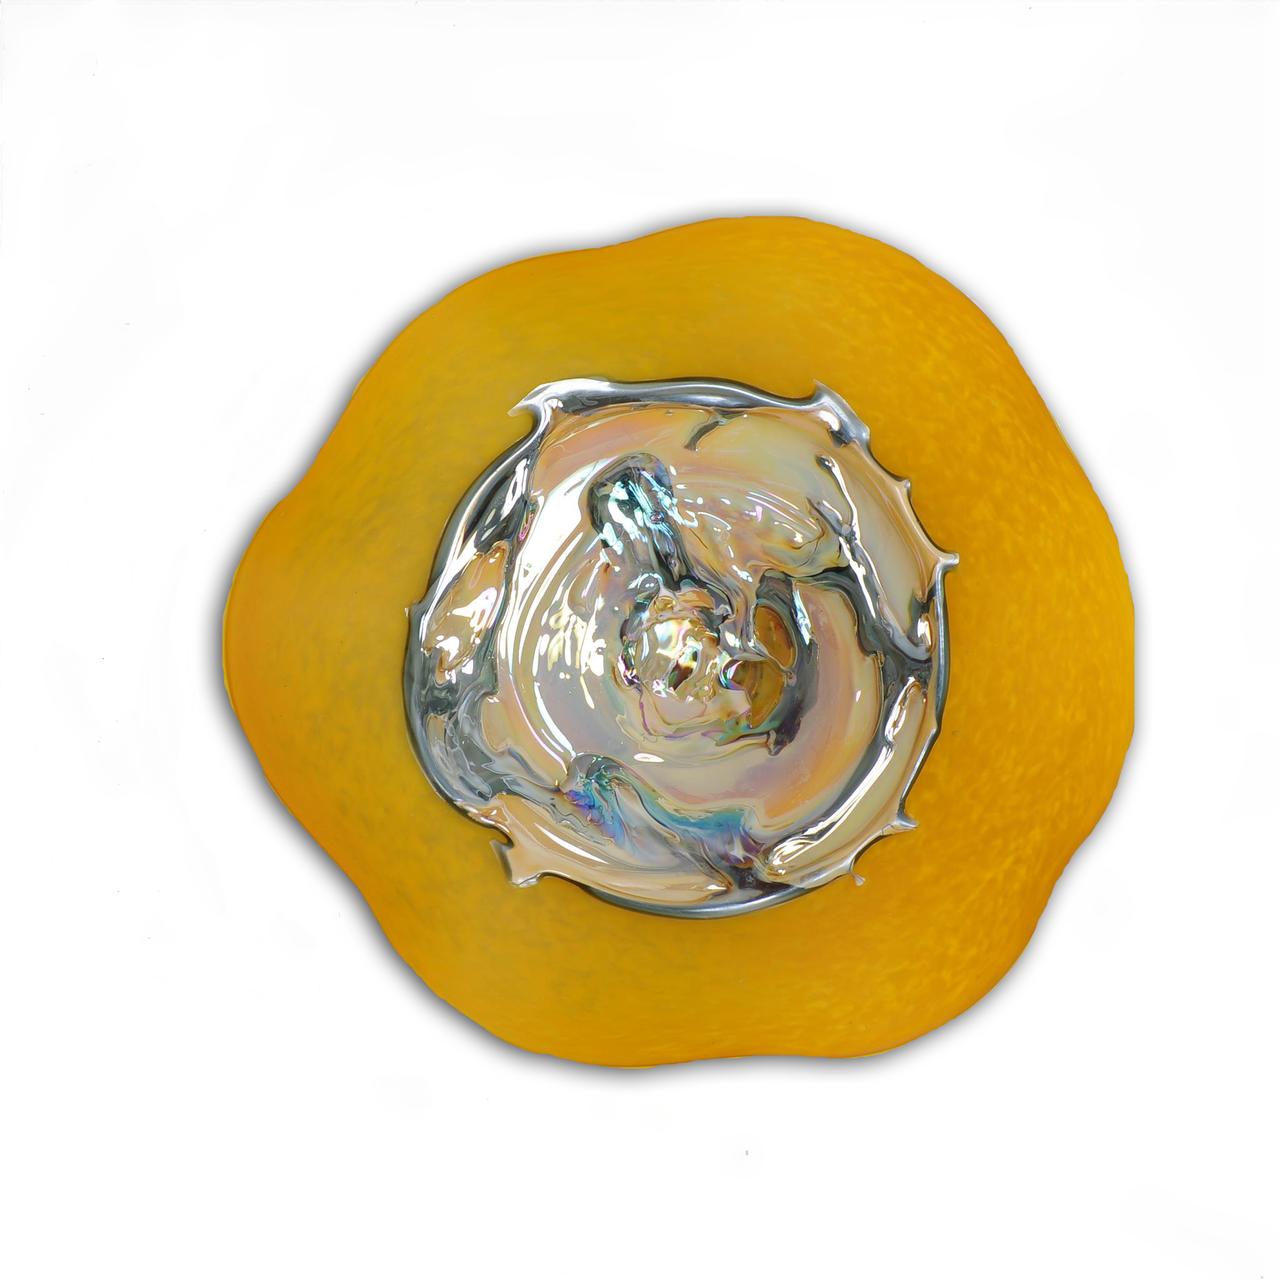 Saffron Glow Grande - Art Glass Wall Plate | Glass and Walls